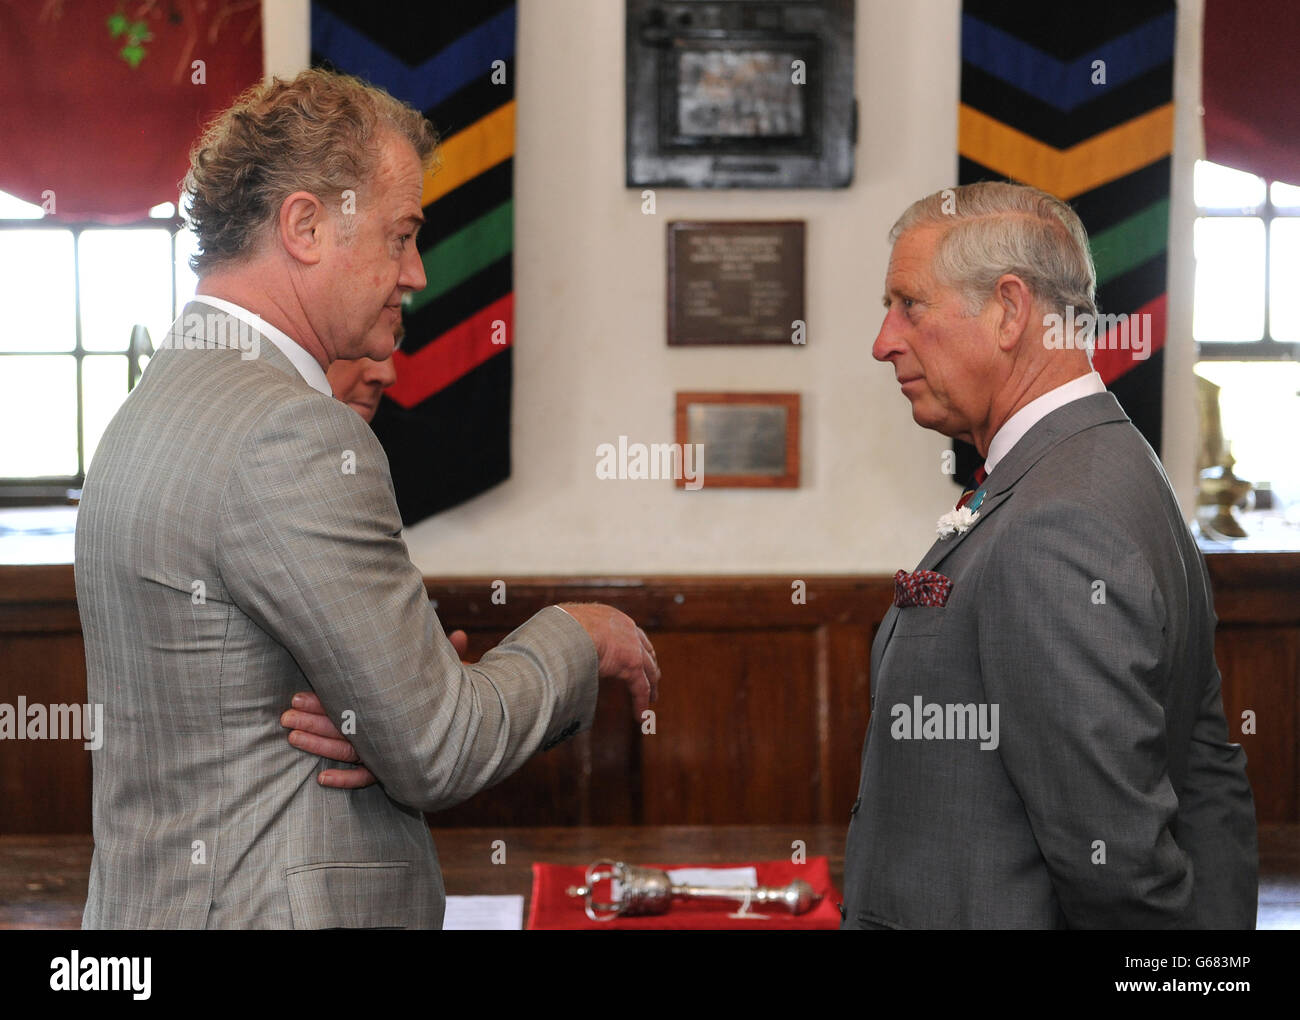 Royal visit to Wales - Day 5 Stock Photo